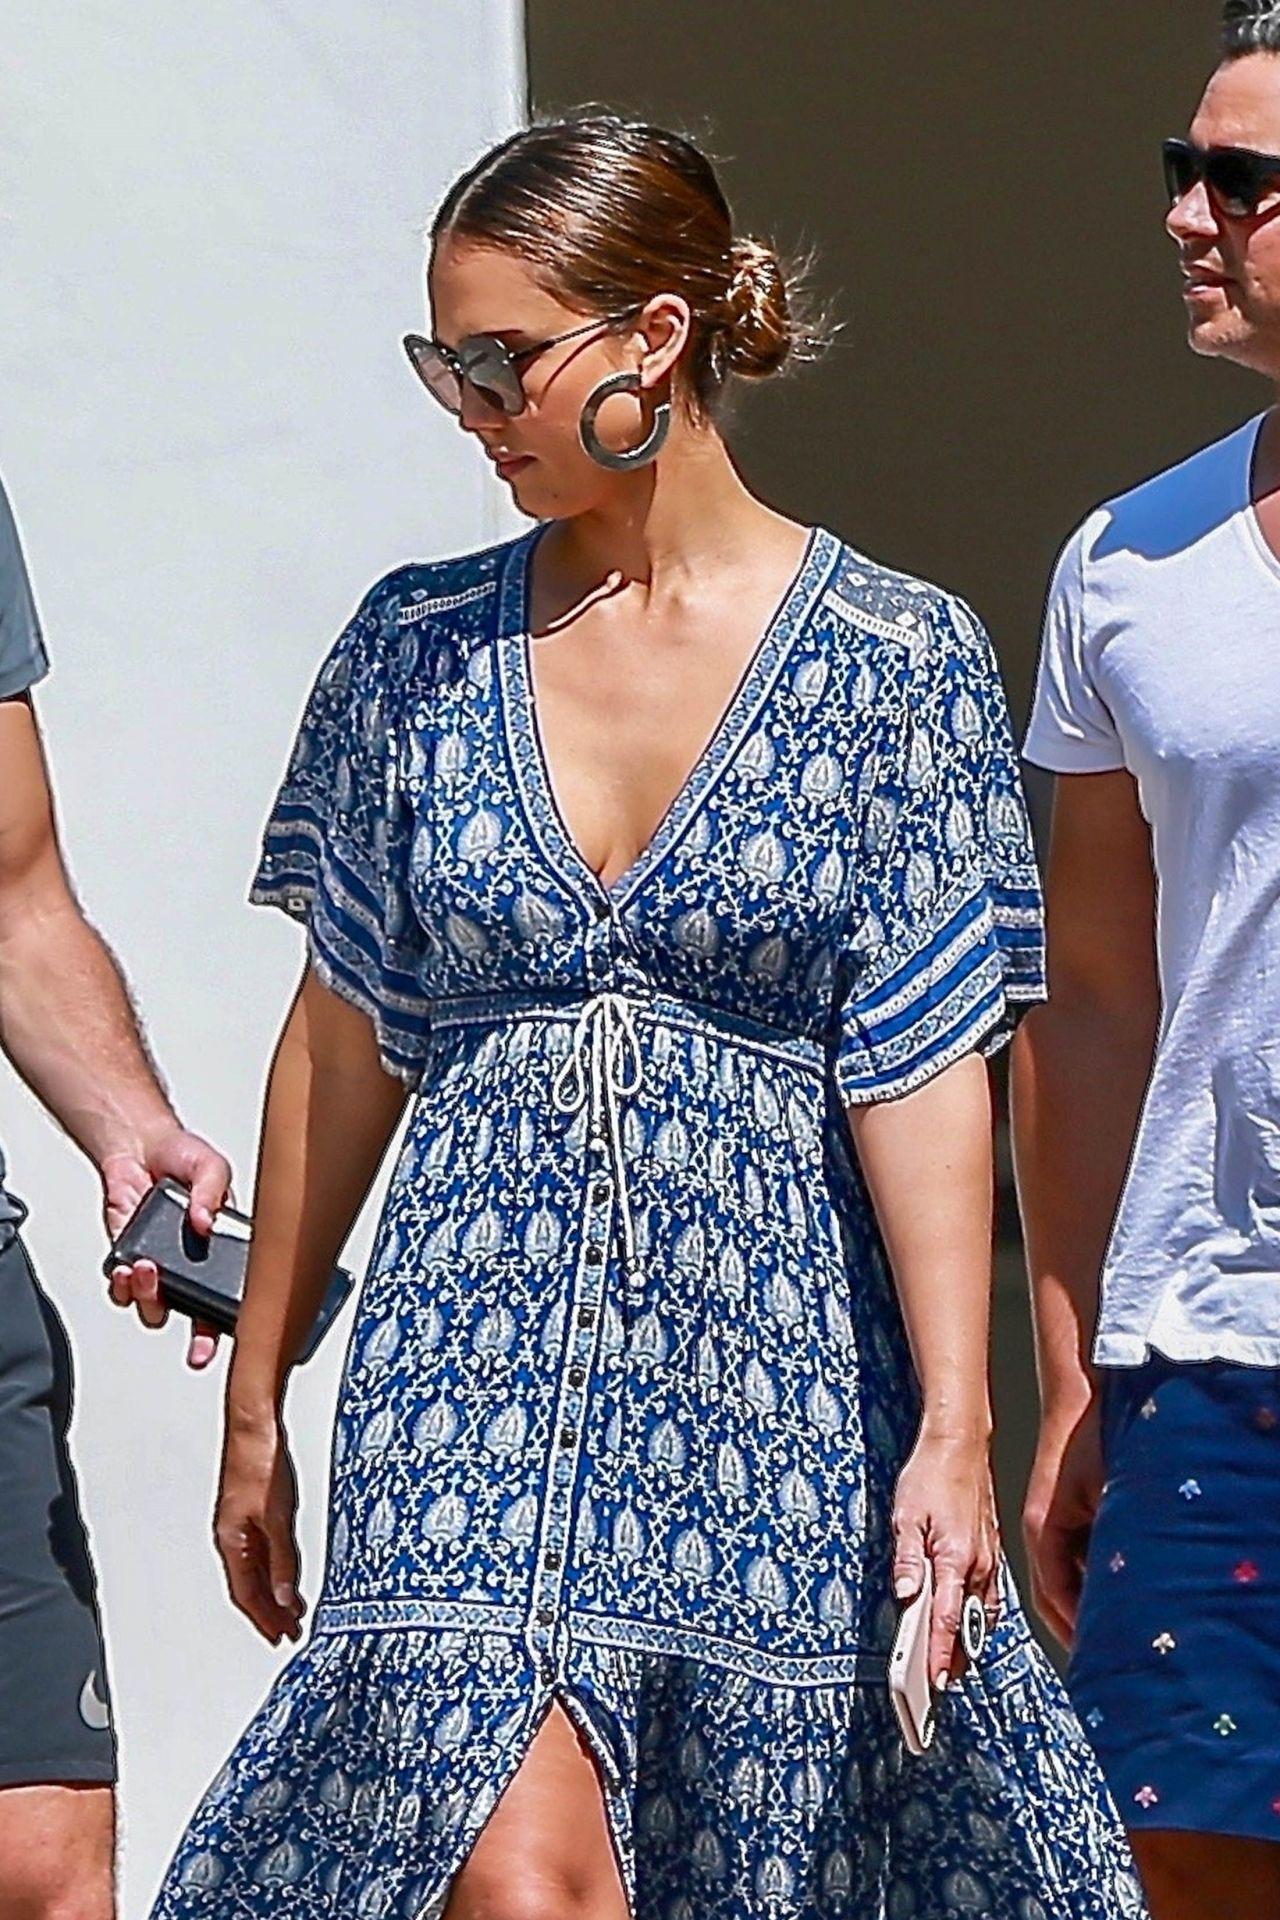 https://celebmafia.com/wp-content/uploads/2018/08/jessica-alba-in-a-summery-blue-dress-shopping-in-la-08-04-2018-7.jpg